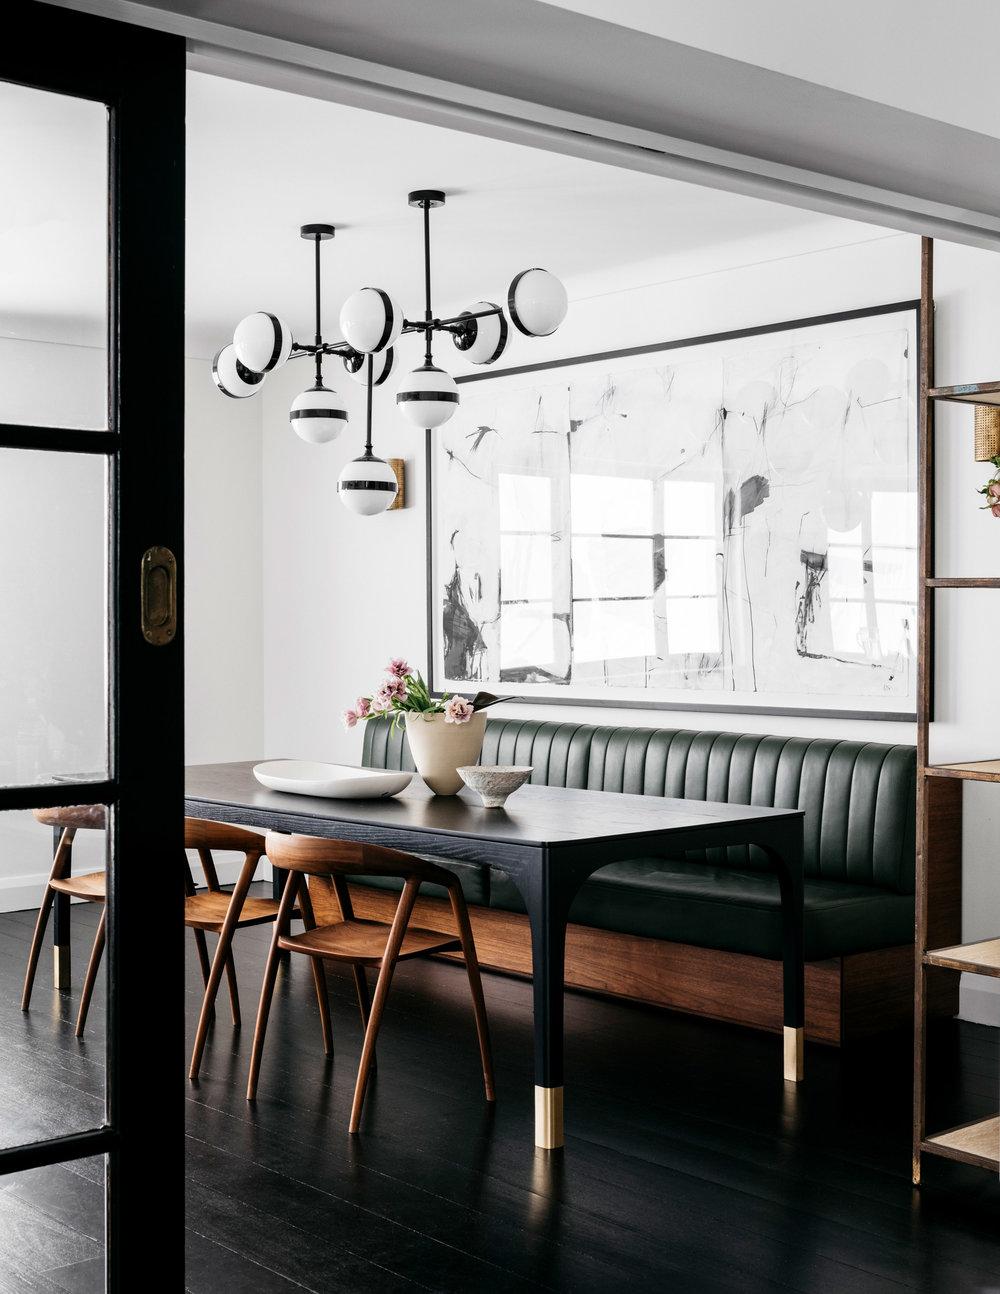 curatorial-house-arent-pyke-interiors-residential-australia-sydney_dezeen_2364_col_8.jpg